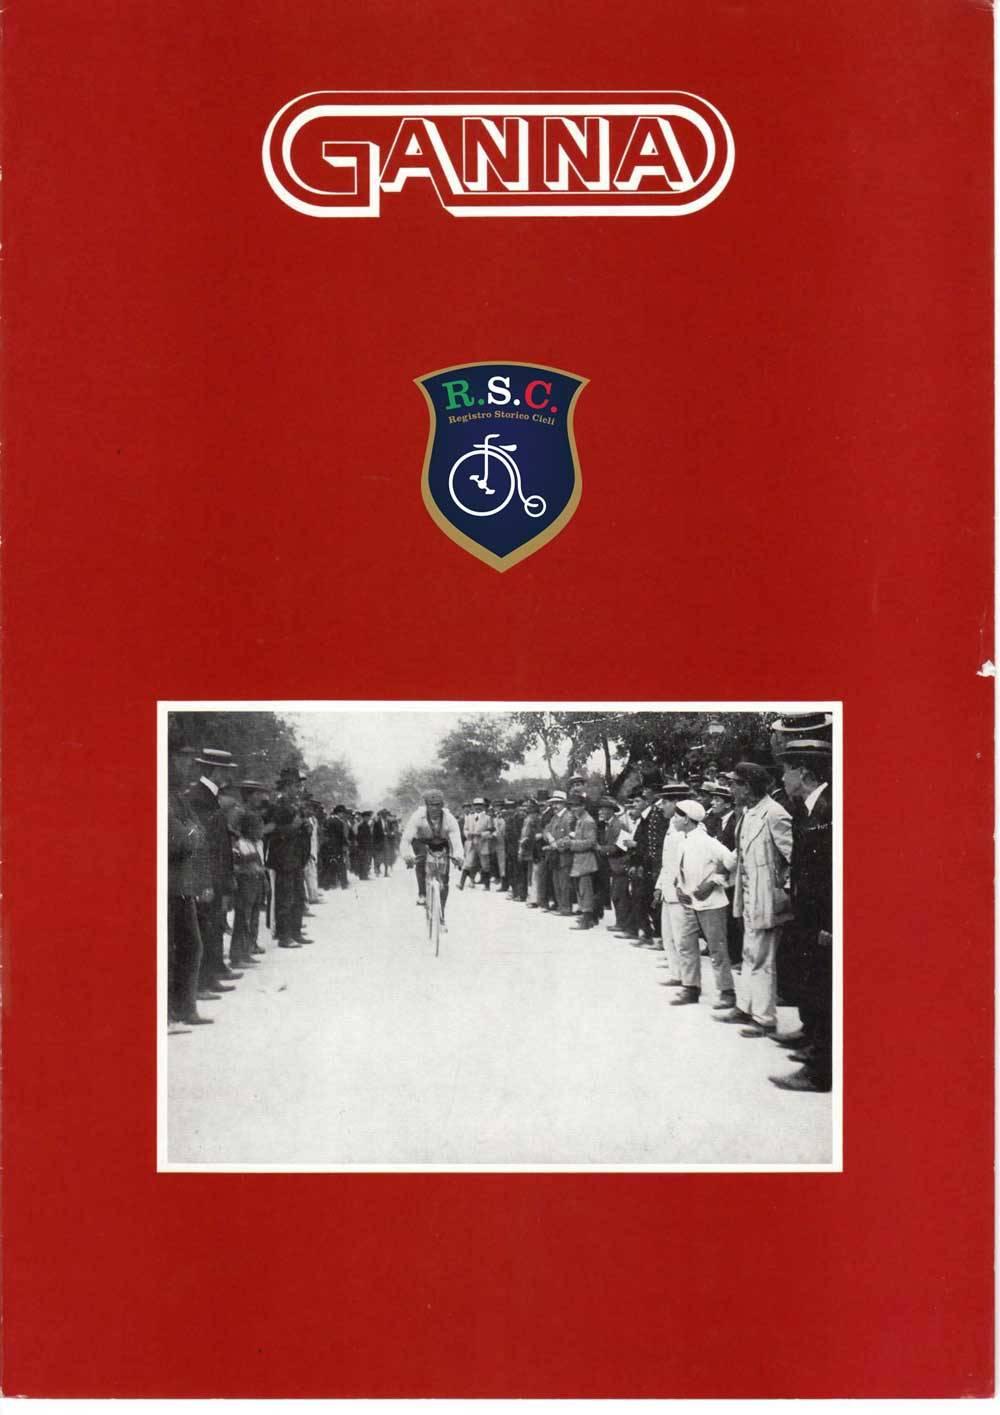 GANNA 1985-page-001